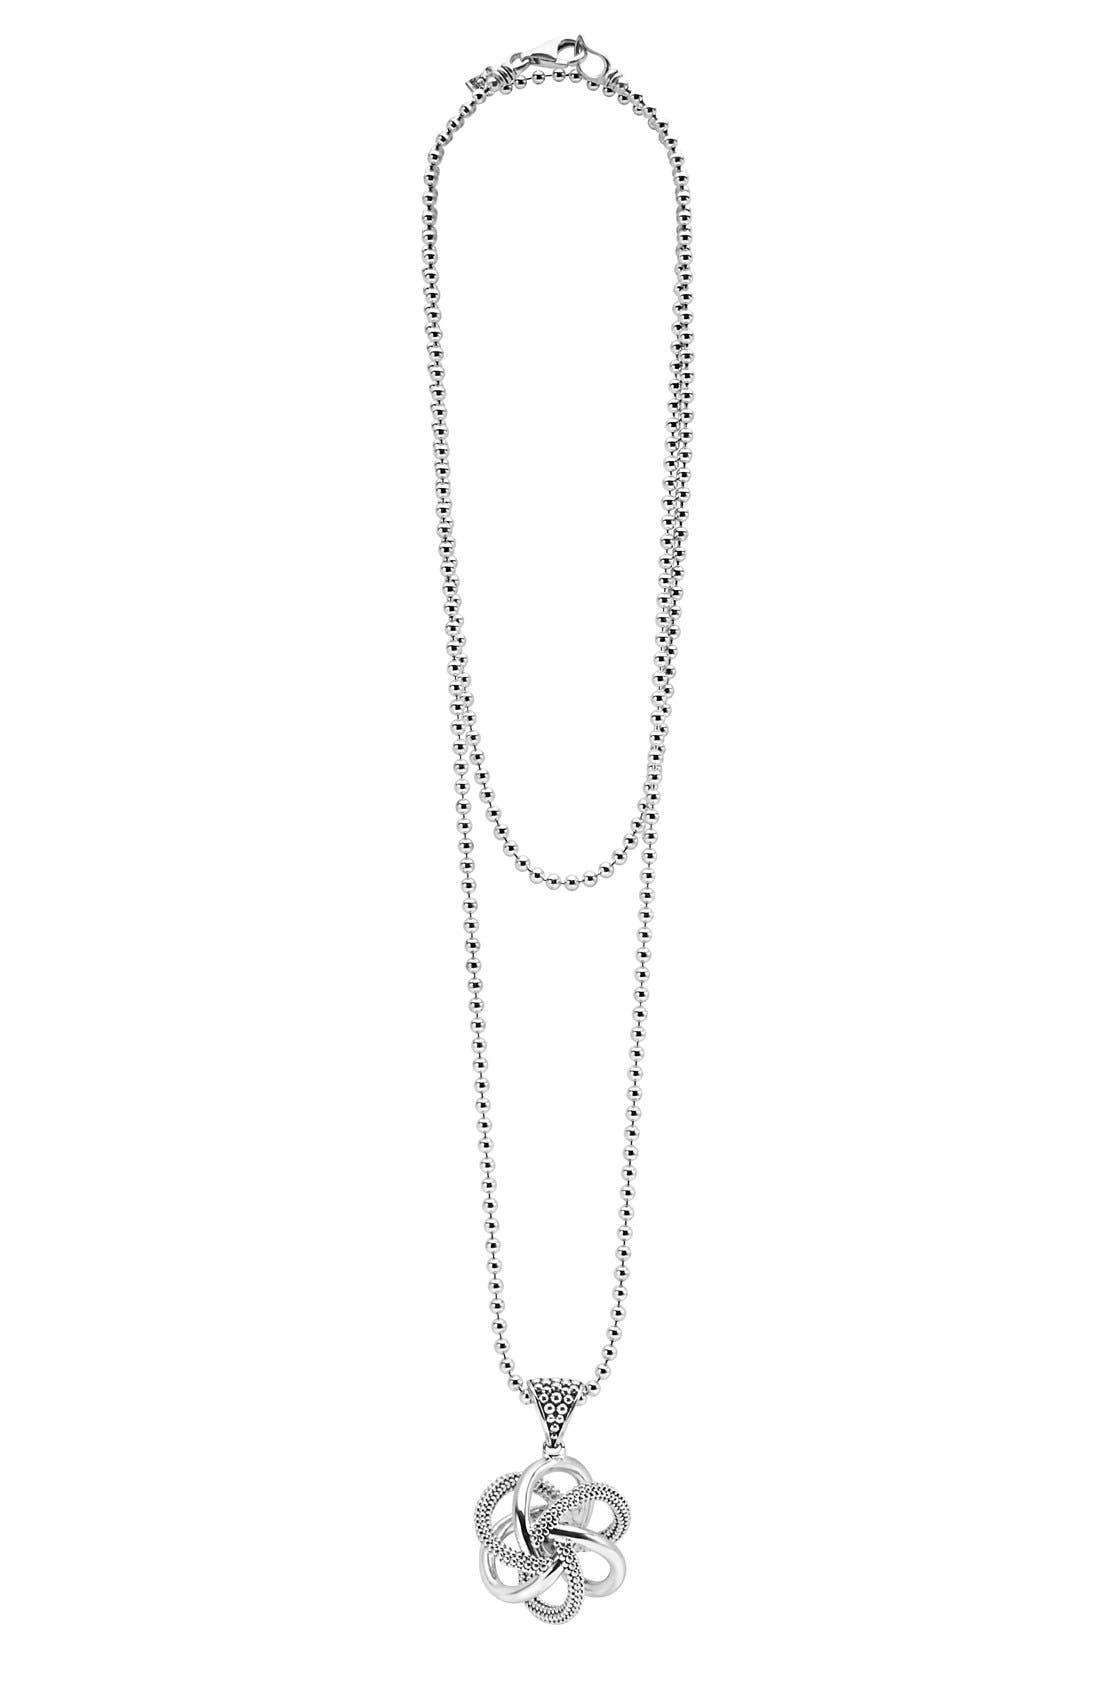 LAGOS 'Love Knot' Long Pendant Necklace